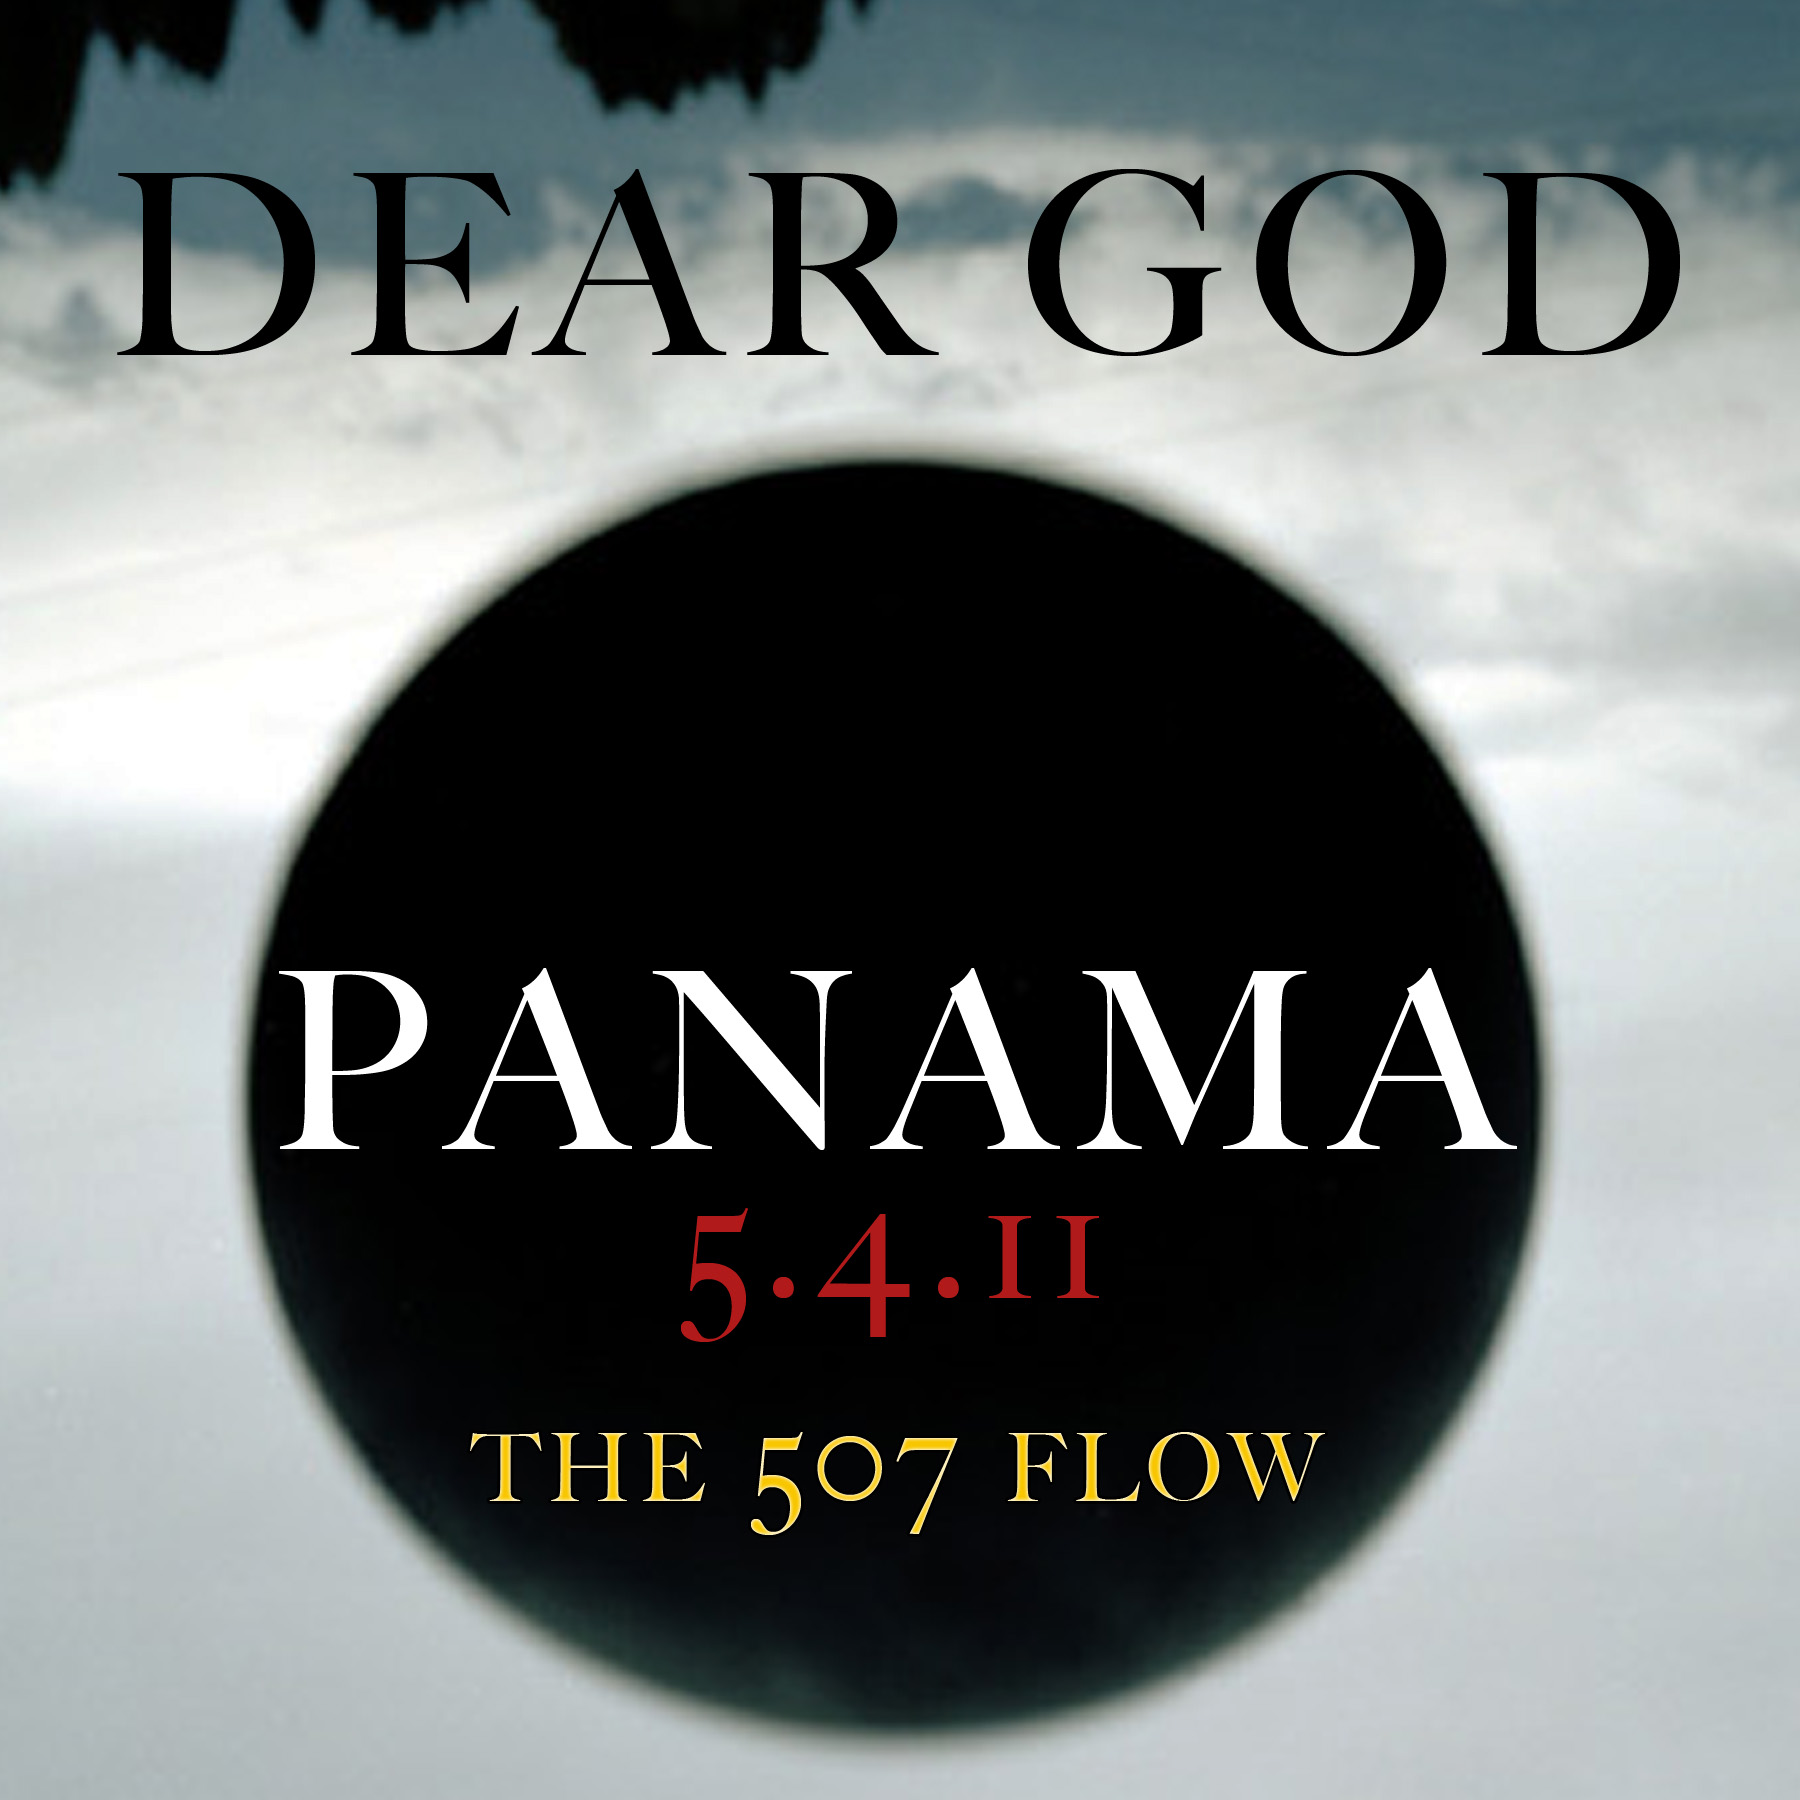 panama - dear god